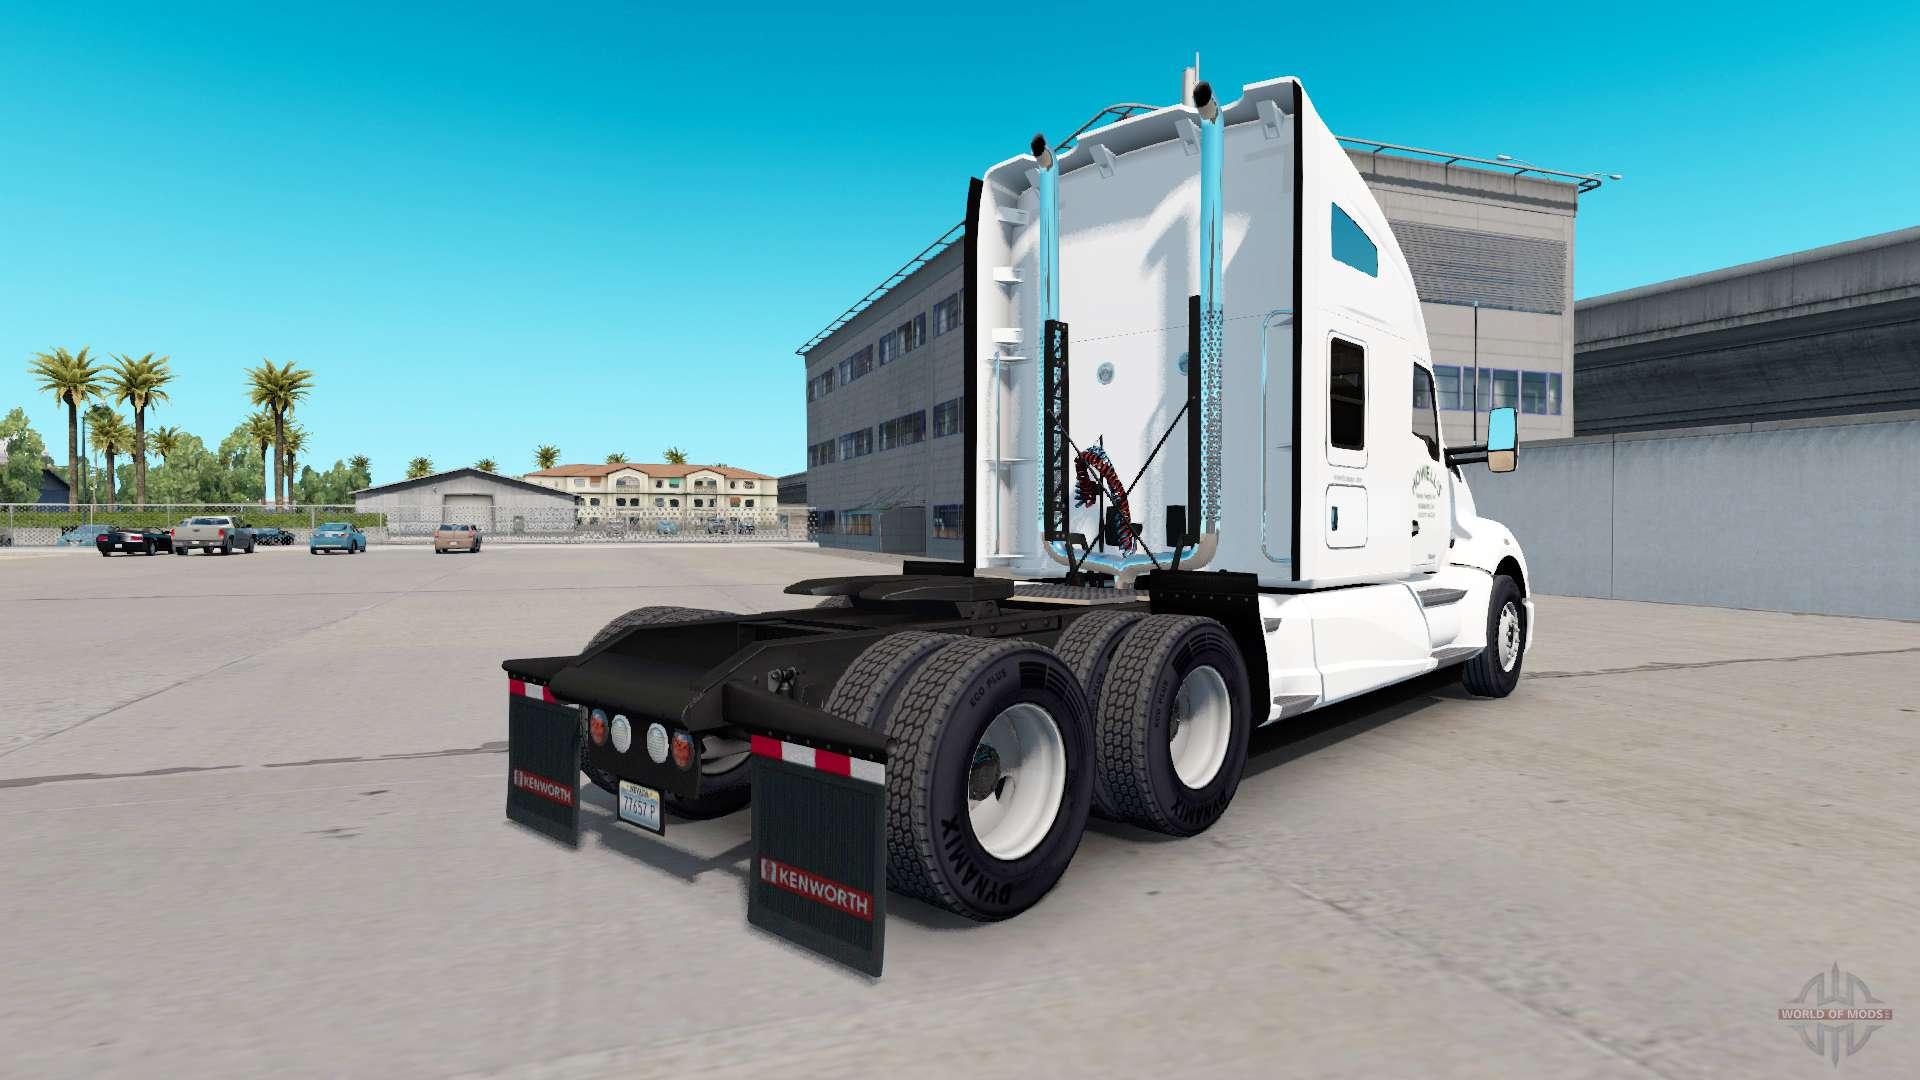 Skin howells motor on a kenworth tractor for american truck simulator jpg 1920x1080 Howells motor freight